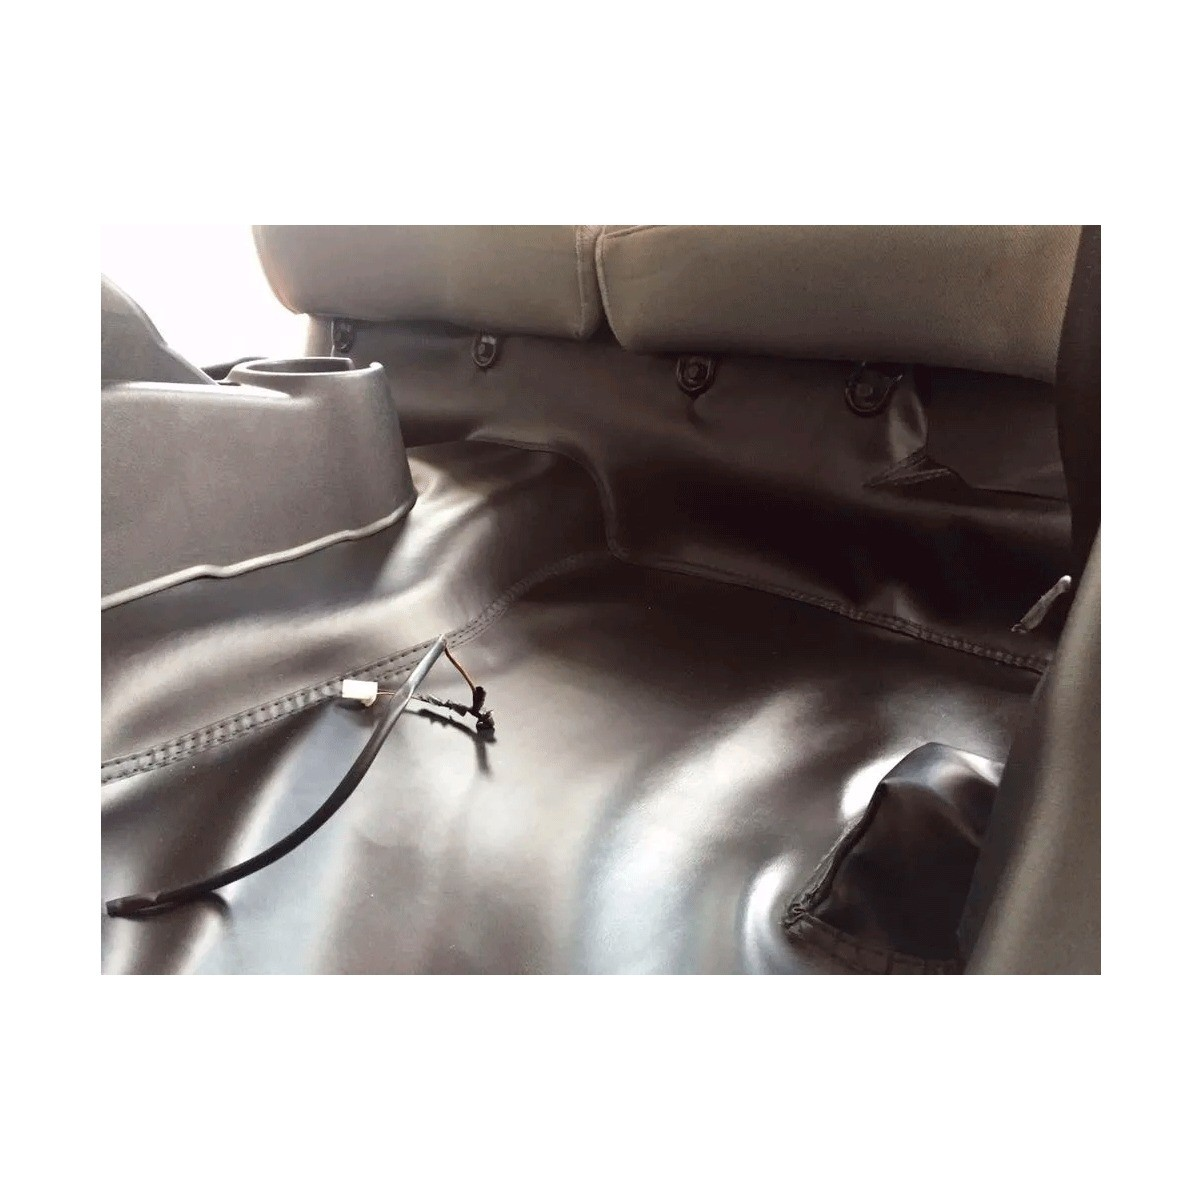 Tapete Automotivo Assoalho Emborrachado Bidim Volkswagen Fox 2003 a 2020